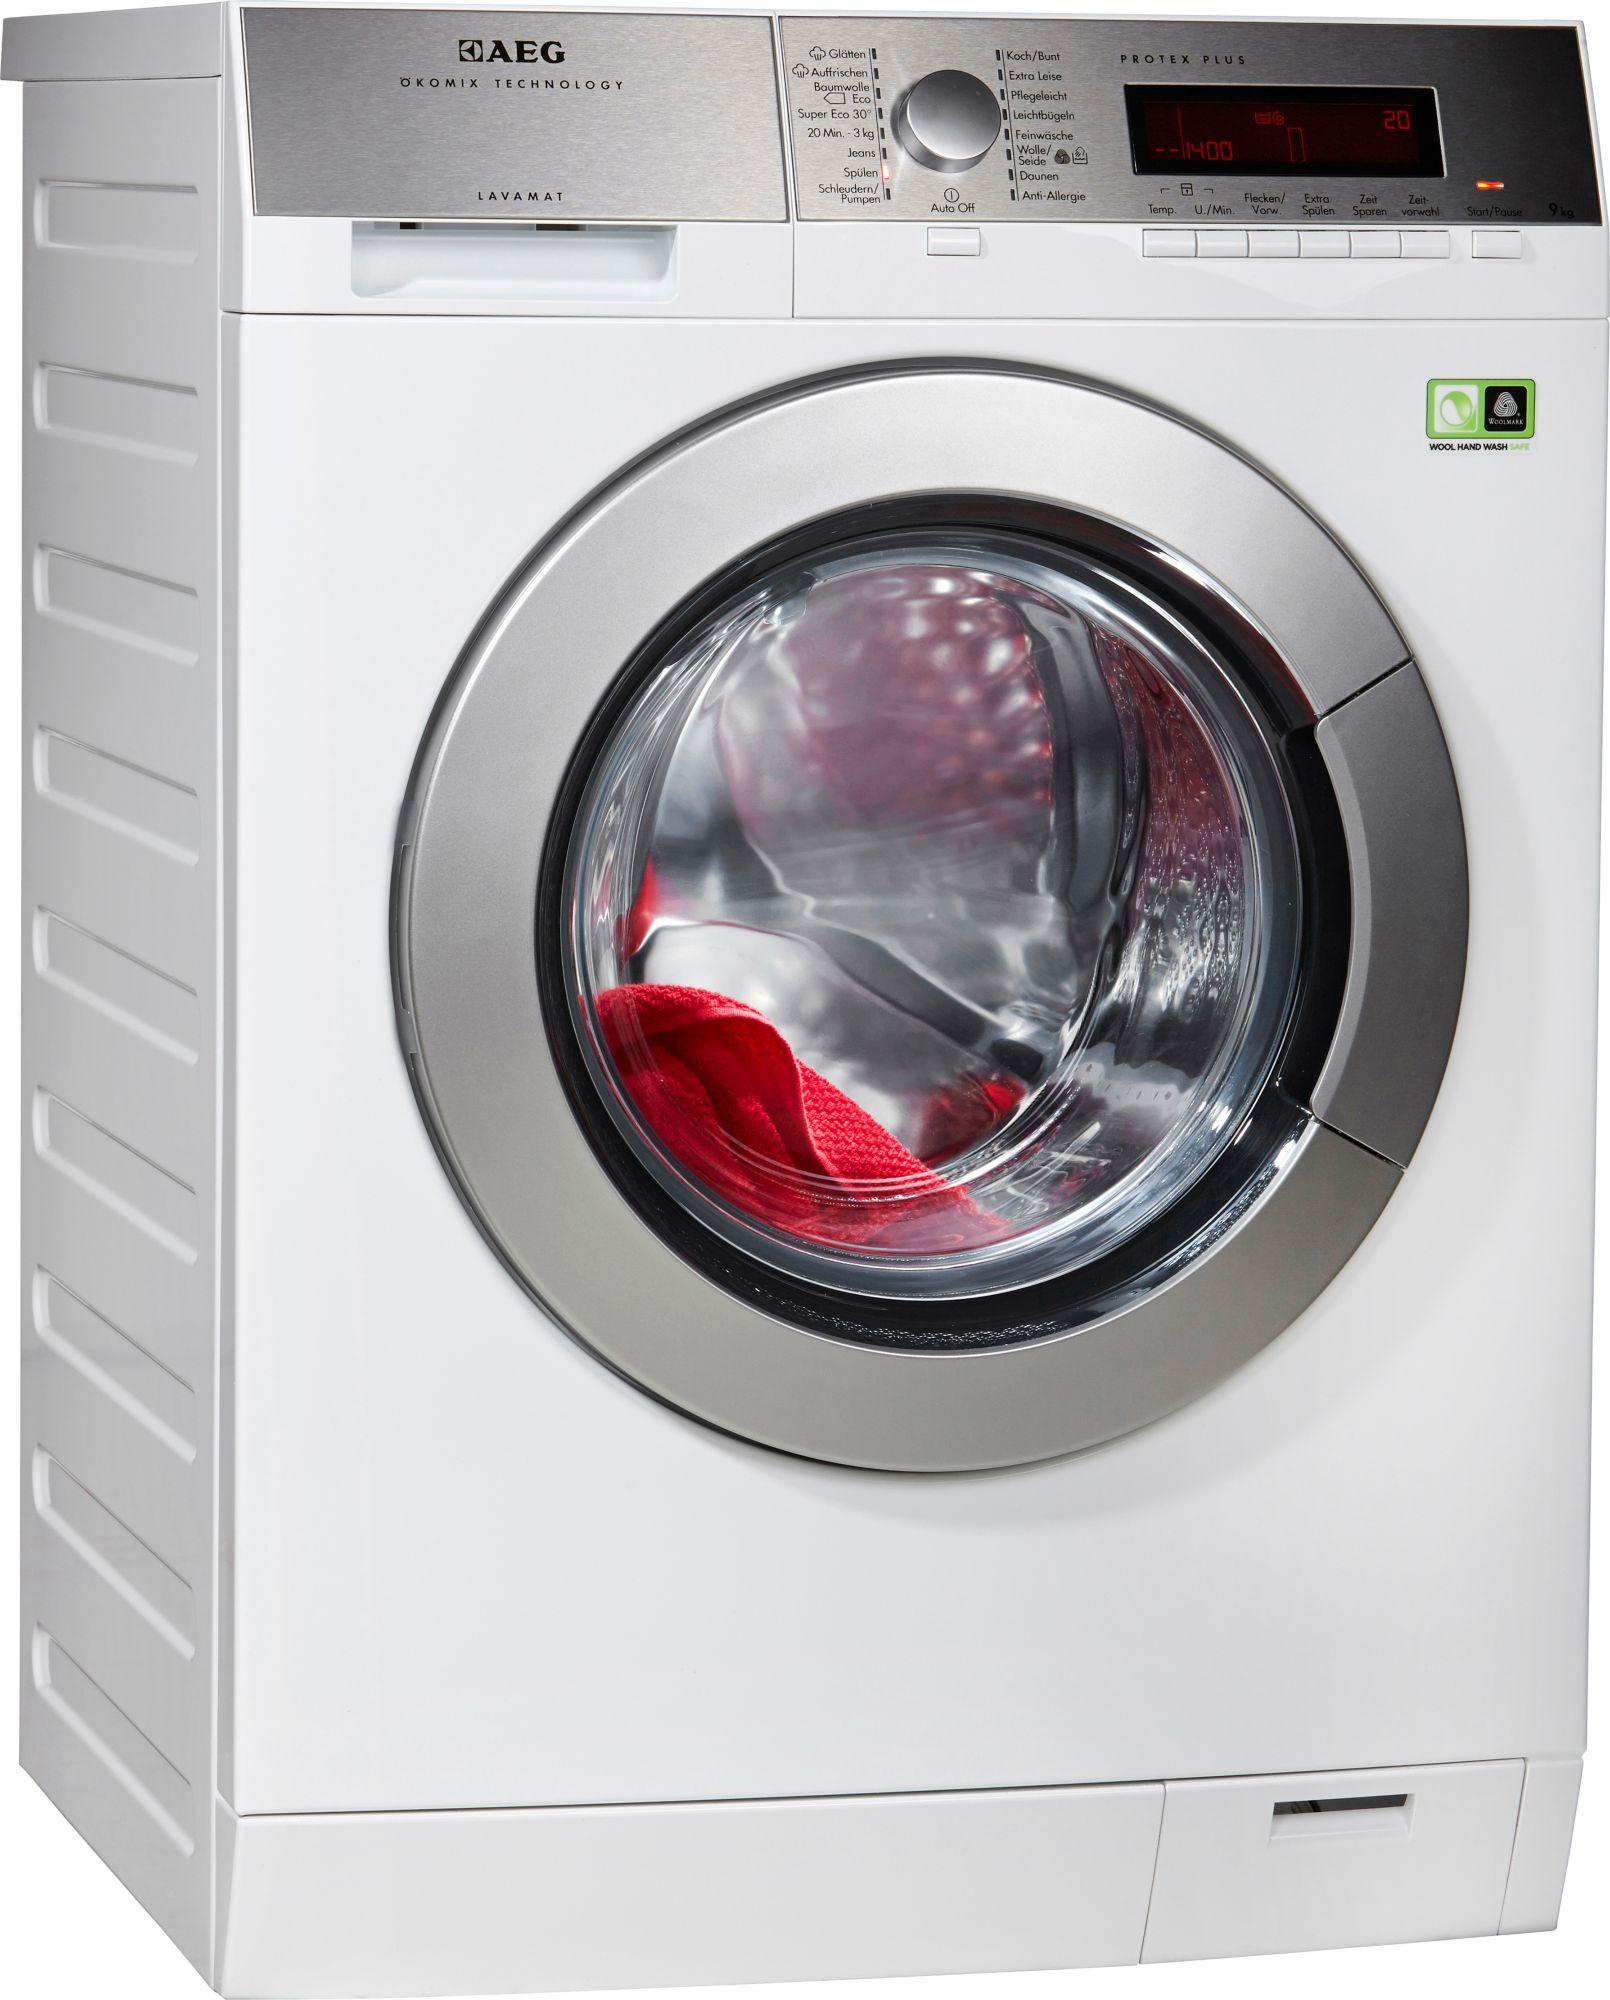 aeg waschmaschine lavamat l89495fl2 a 9 kg 1400 u. Black Bedroom Furniture Sets. Home Design Ideas